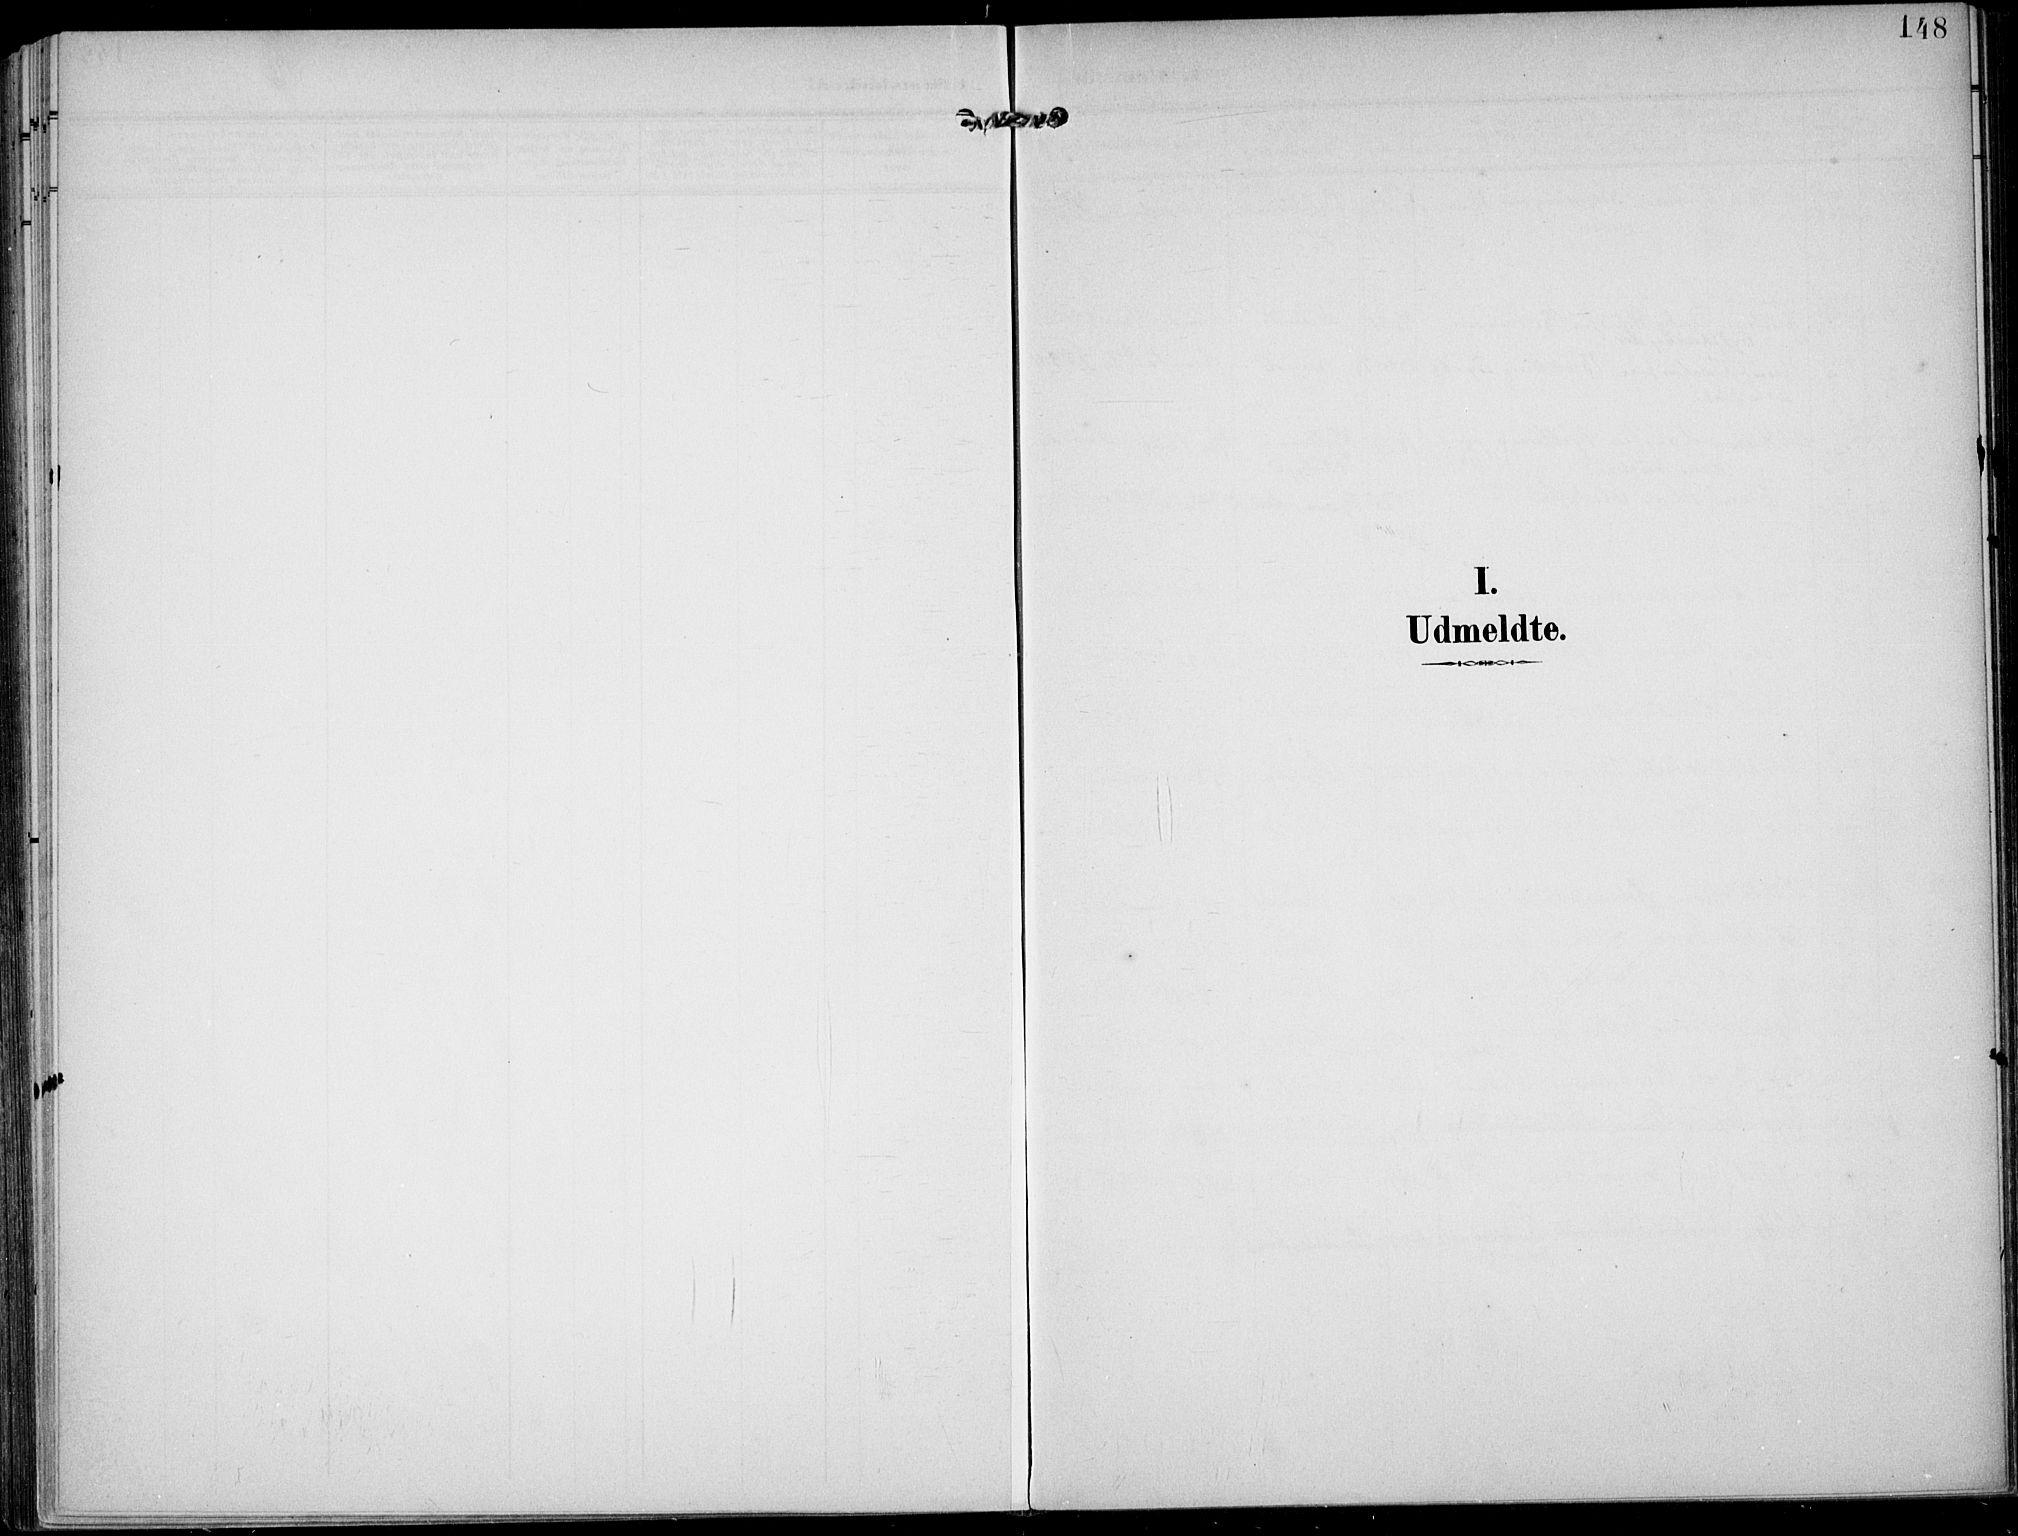 SAKO, Lunde kirkebøker, F/Fa/L0004: Ministerialbok nr. I 4, 1902-1913, s. 148